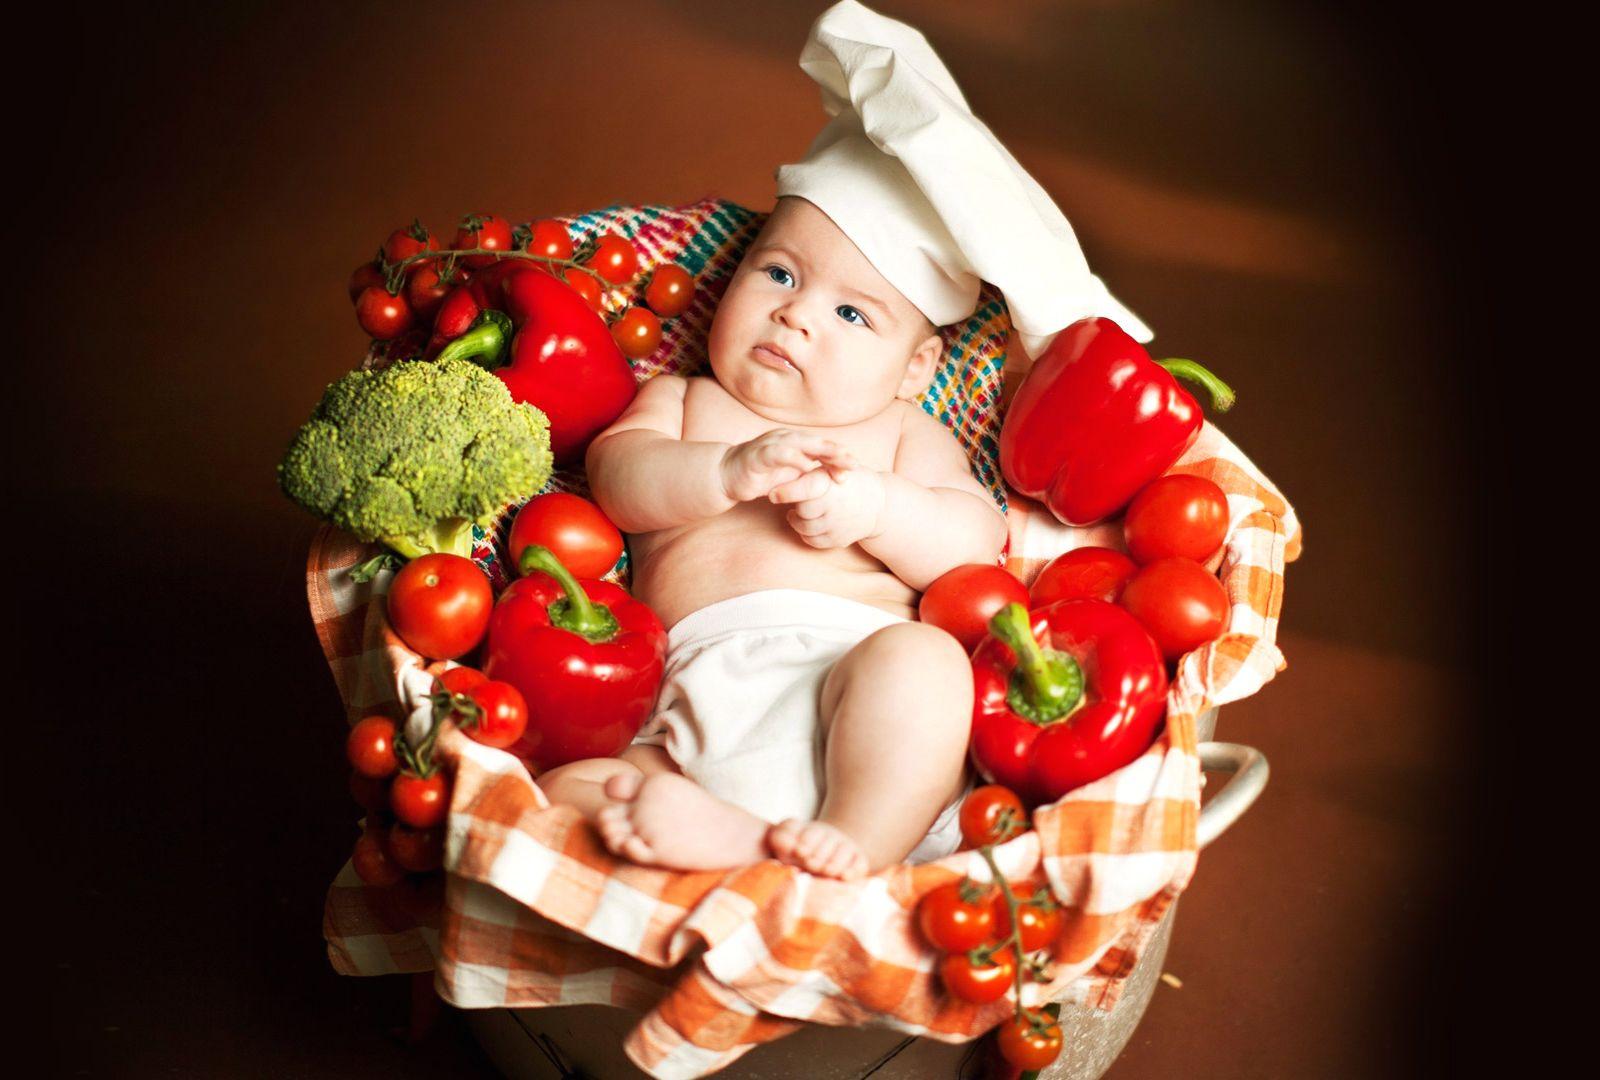 Boy Baby Images Hd - HD Wallpaper